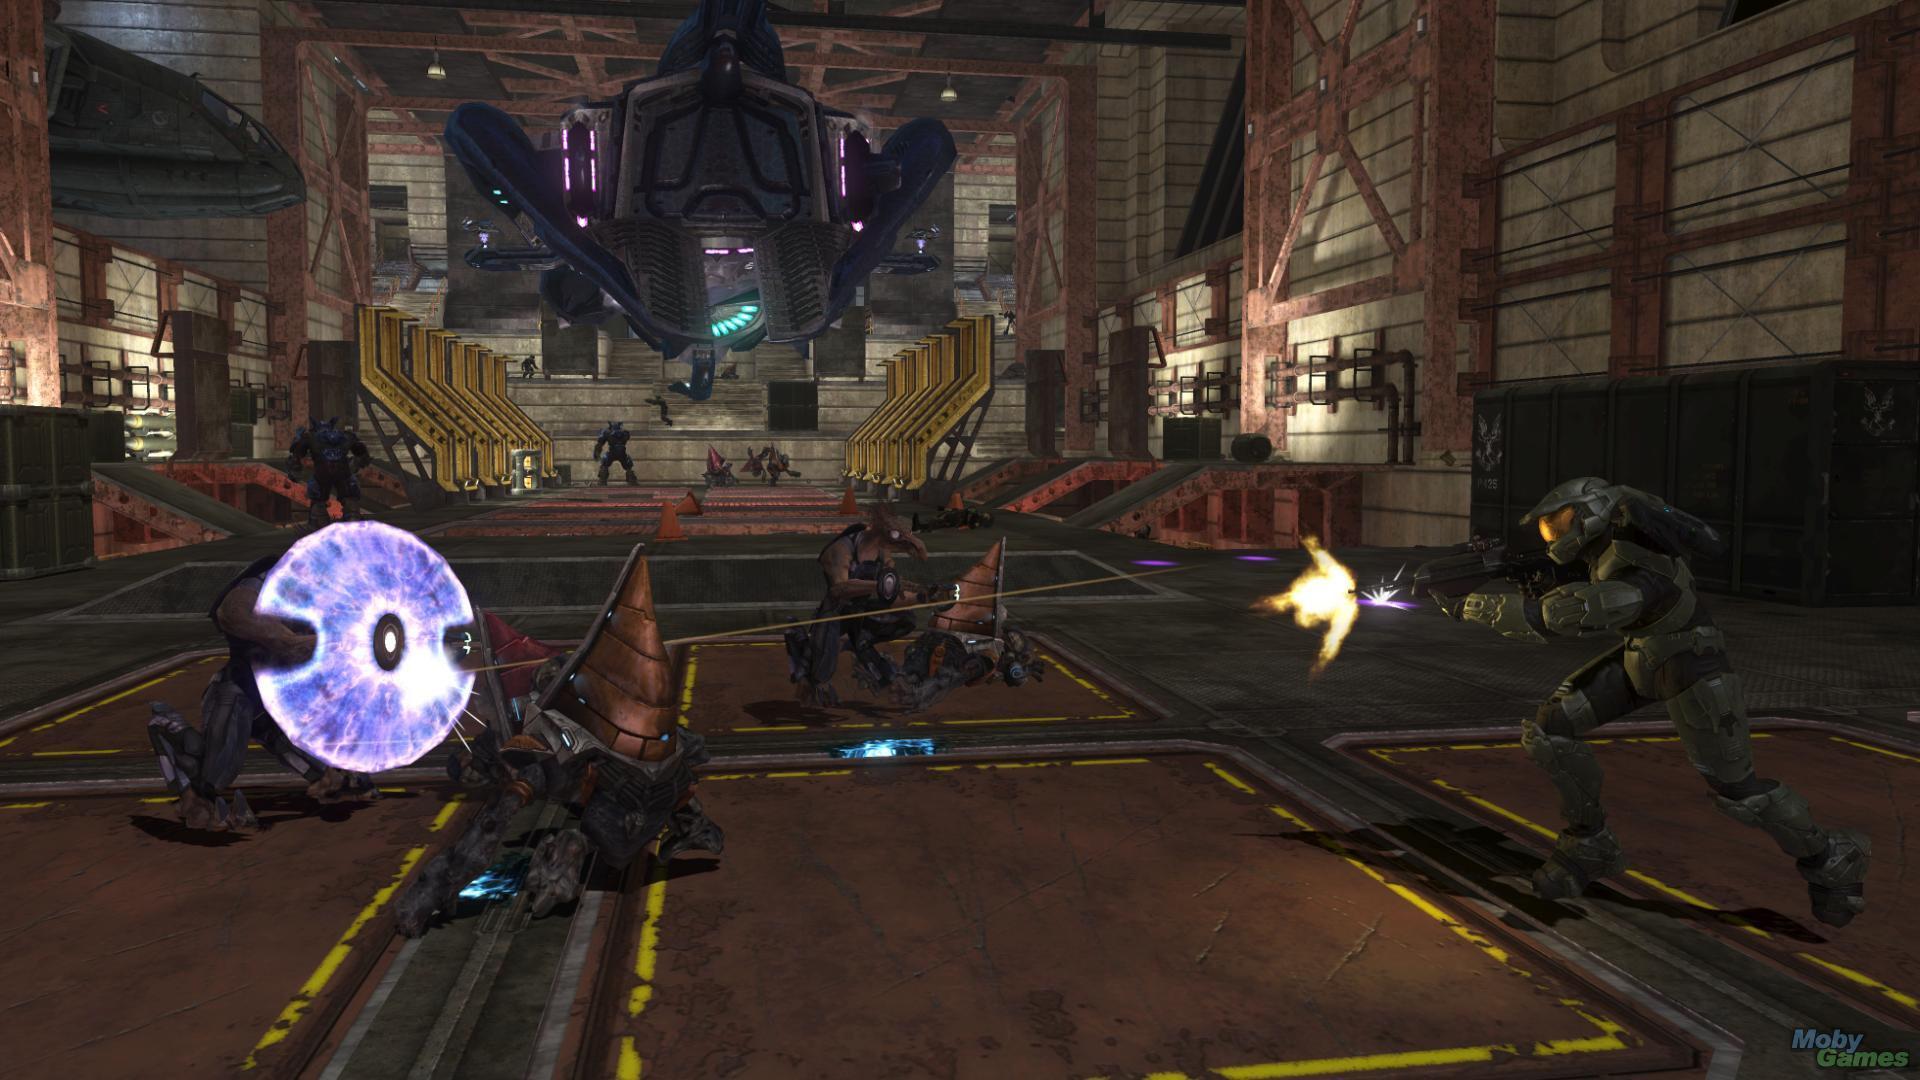 Screenshots Halo 3 Halo Halo 3 Screenshot